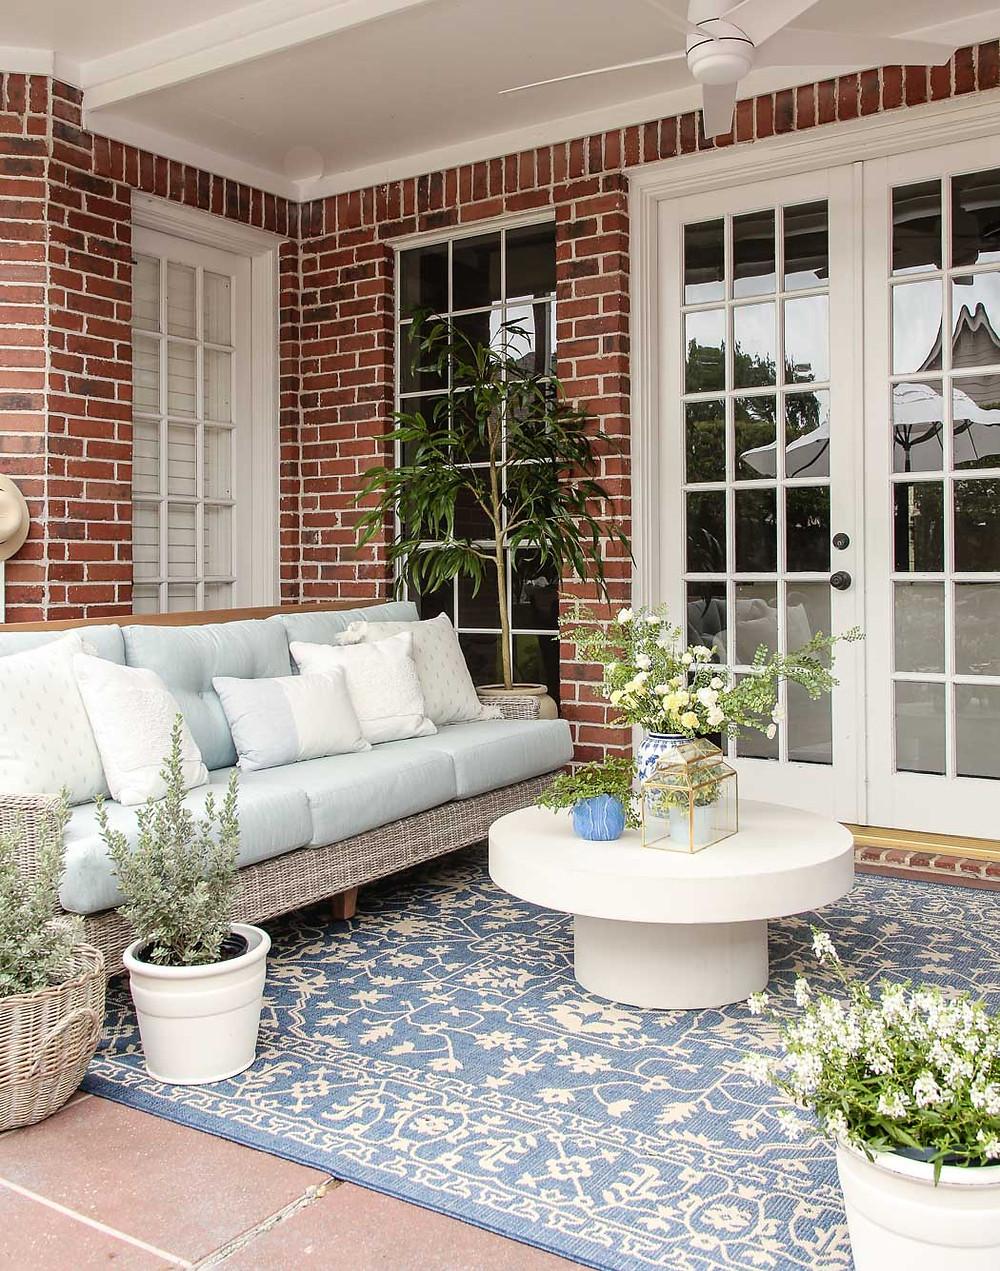 cindy crawford hamptons cove sofa mist, blue outdoor rug, backyard makeover